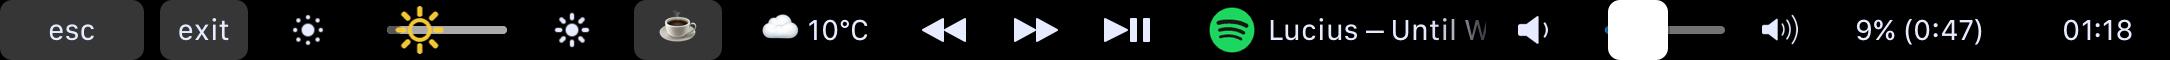 My TouchBar.My rules:定制你自己的 TouchBar插图1